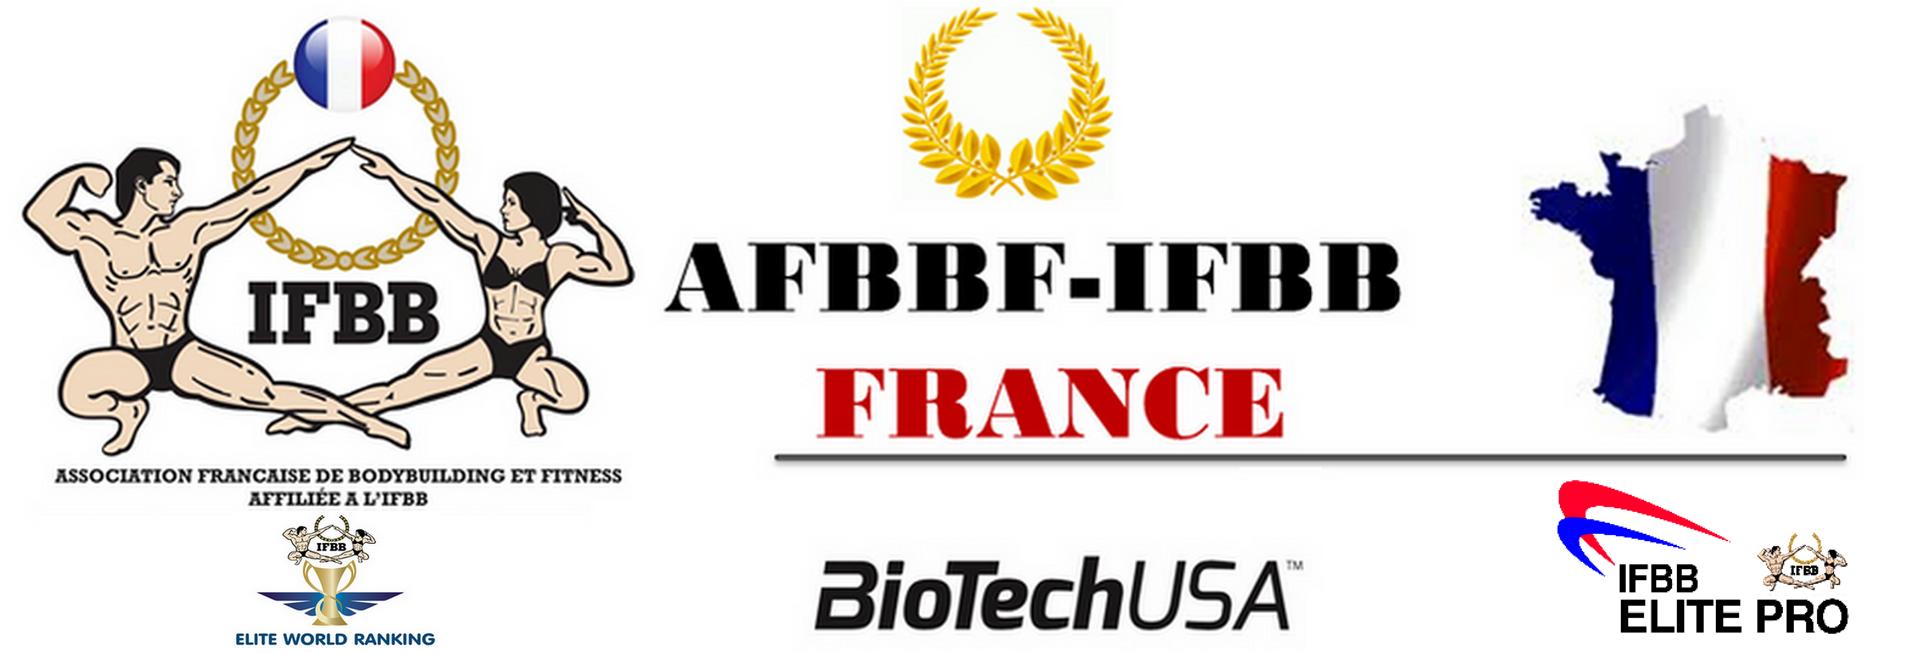 Banniere avec biotech 1